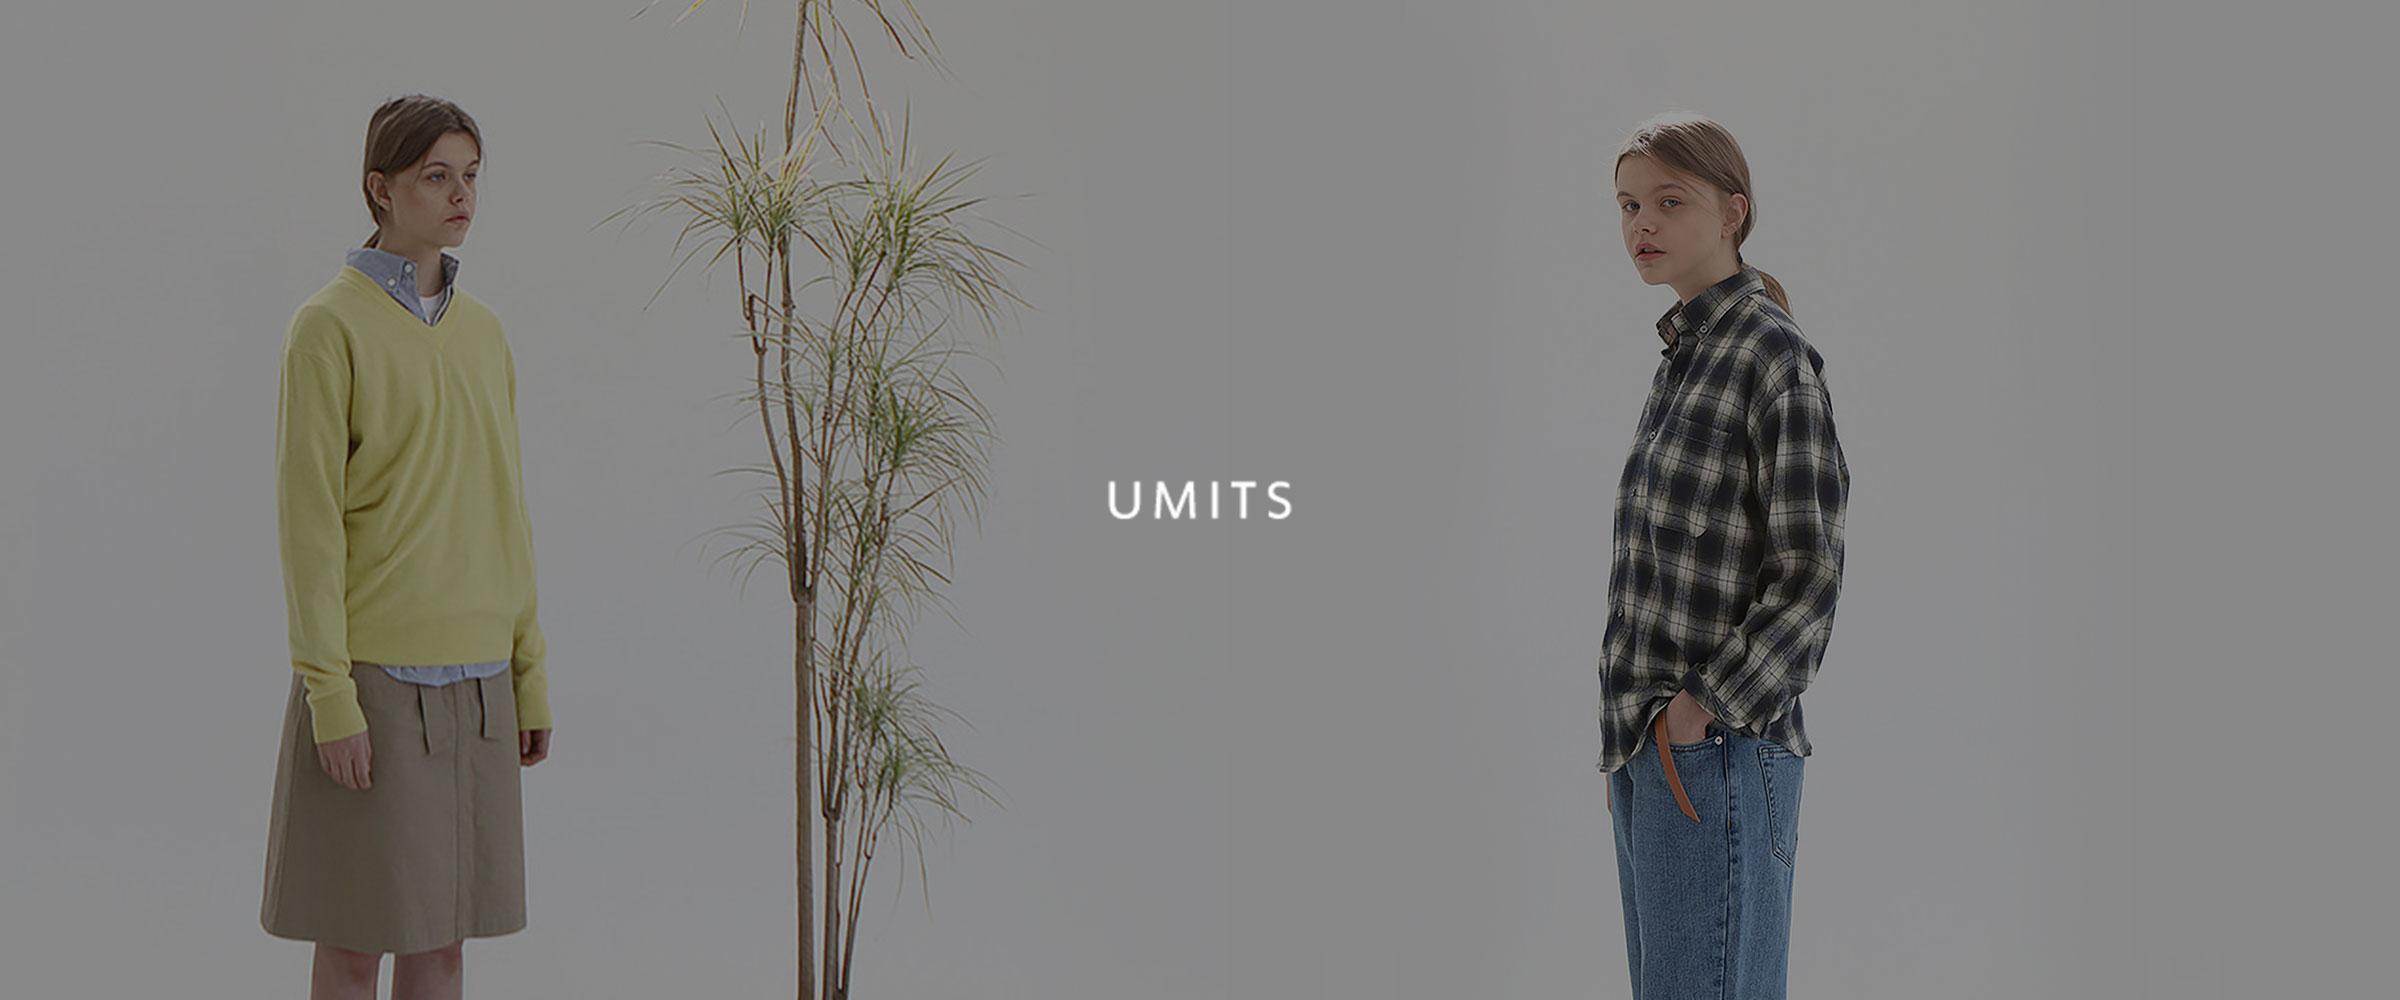 umits.jpg